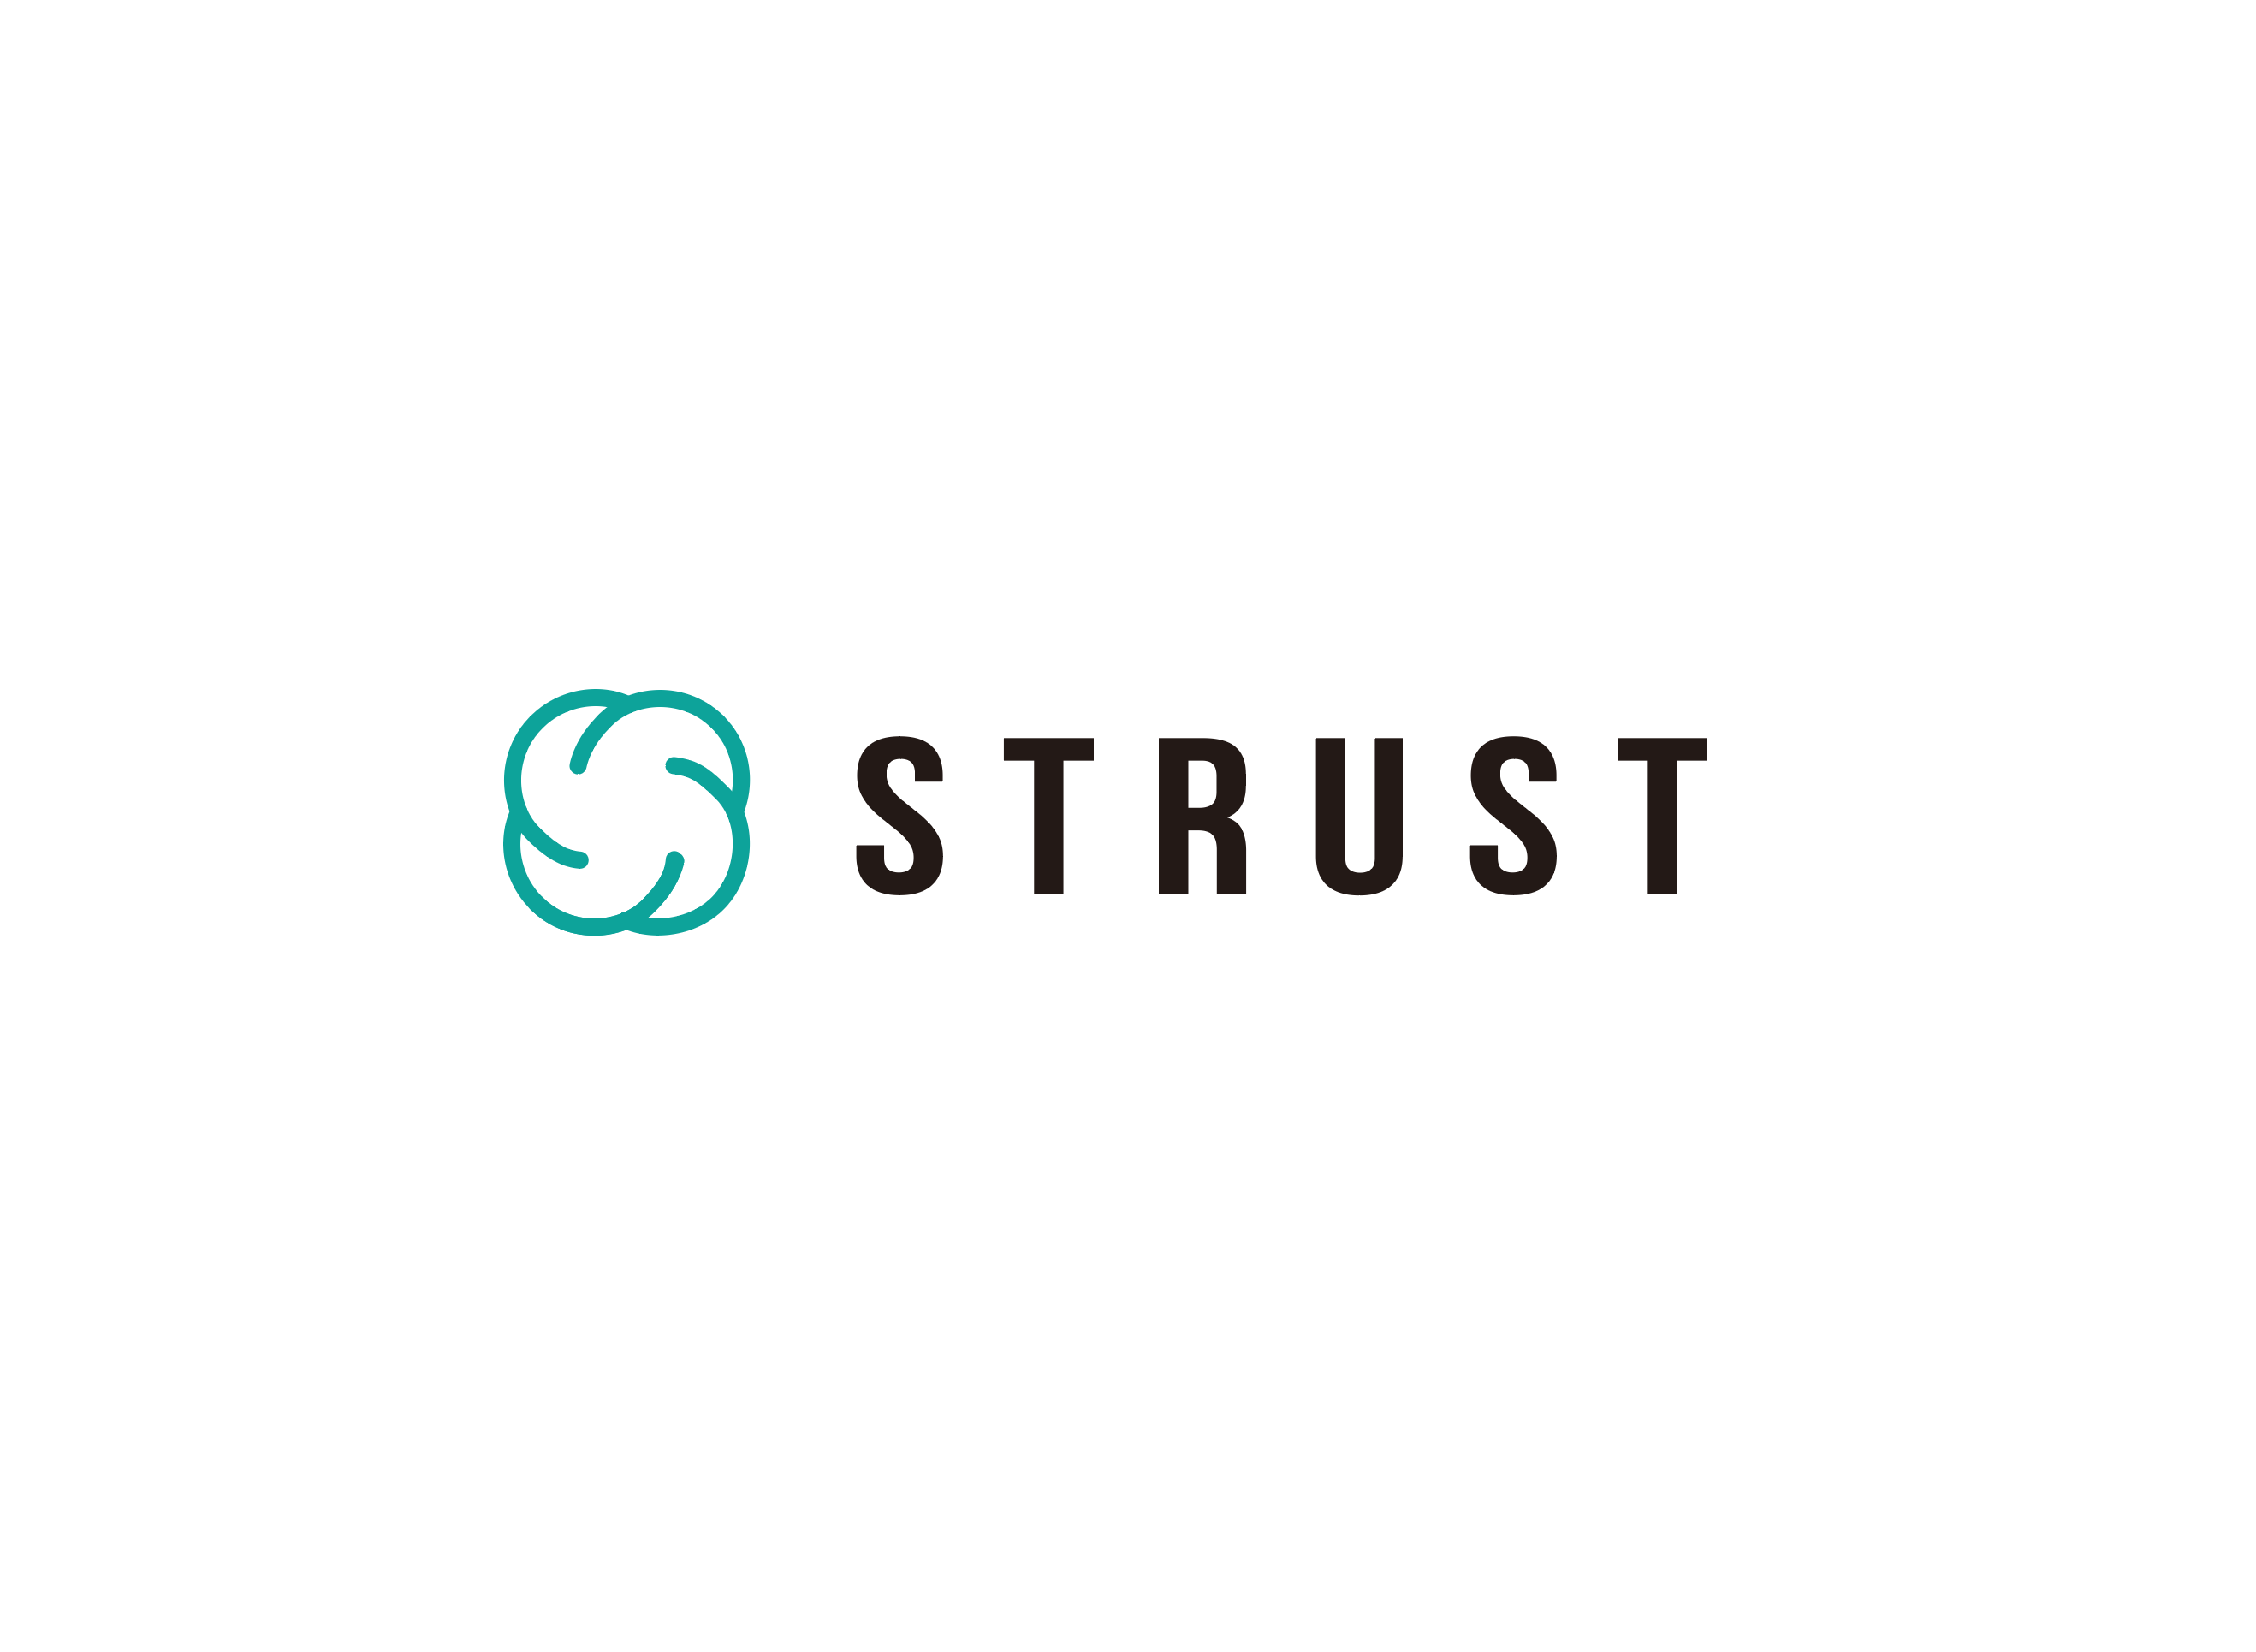 STRUSTのロゴマーク